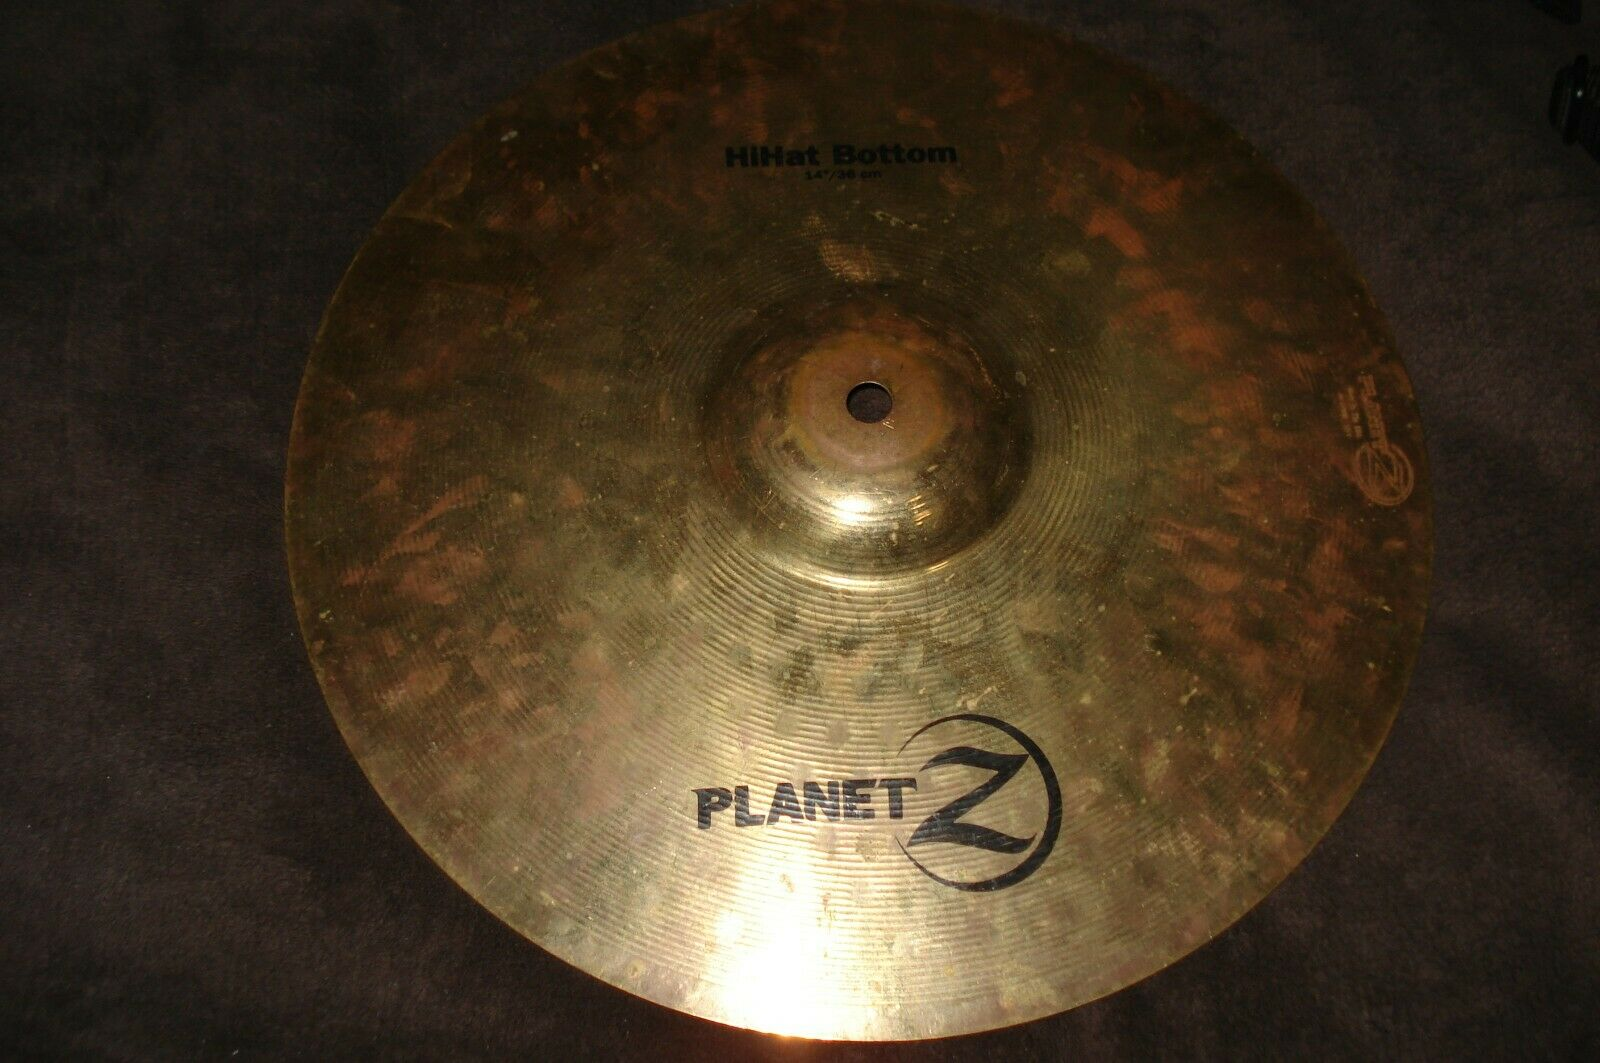 Planet Z Hi-Hat Bottom 14 /36 Cm Drum Cymbal - $30.00